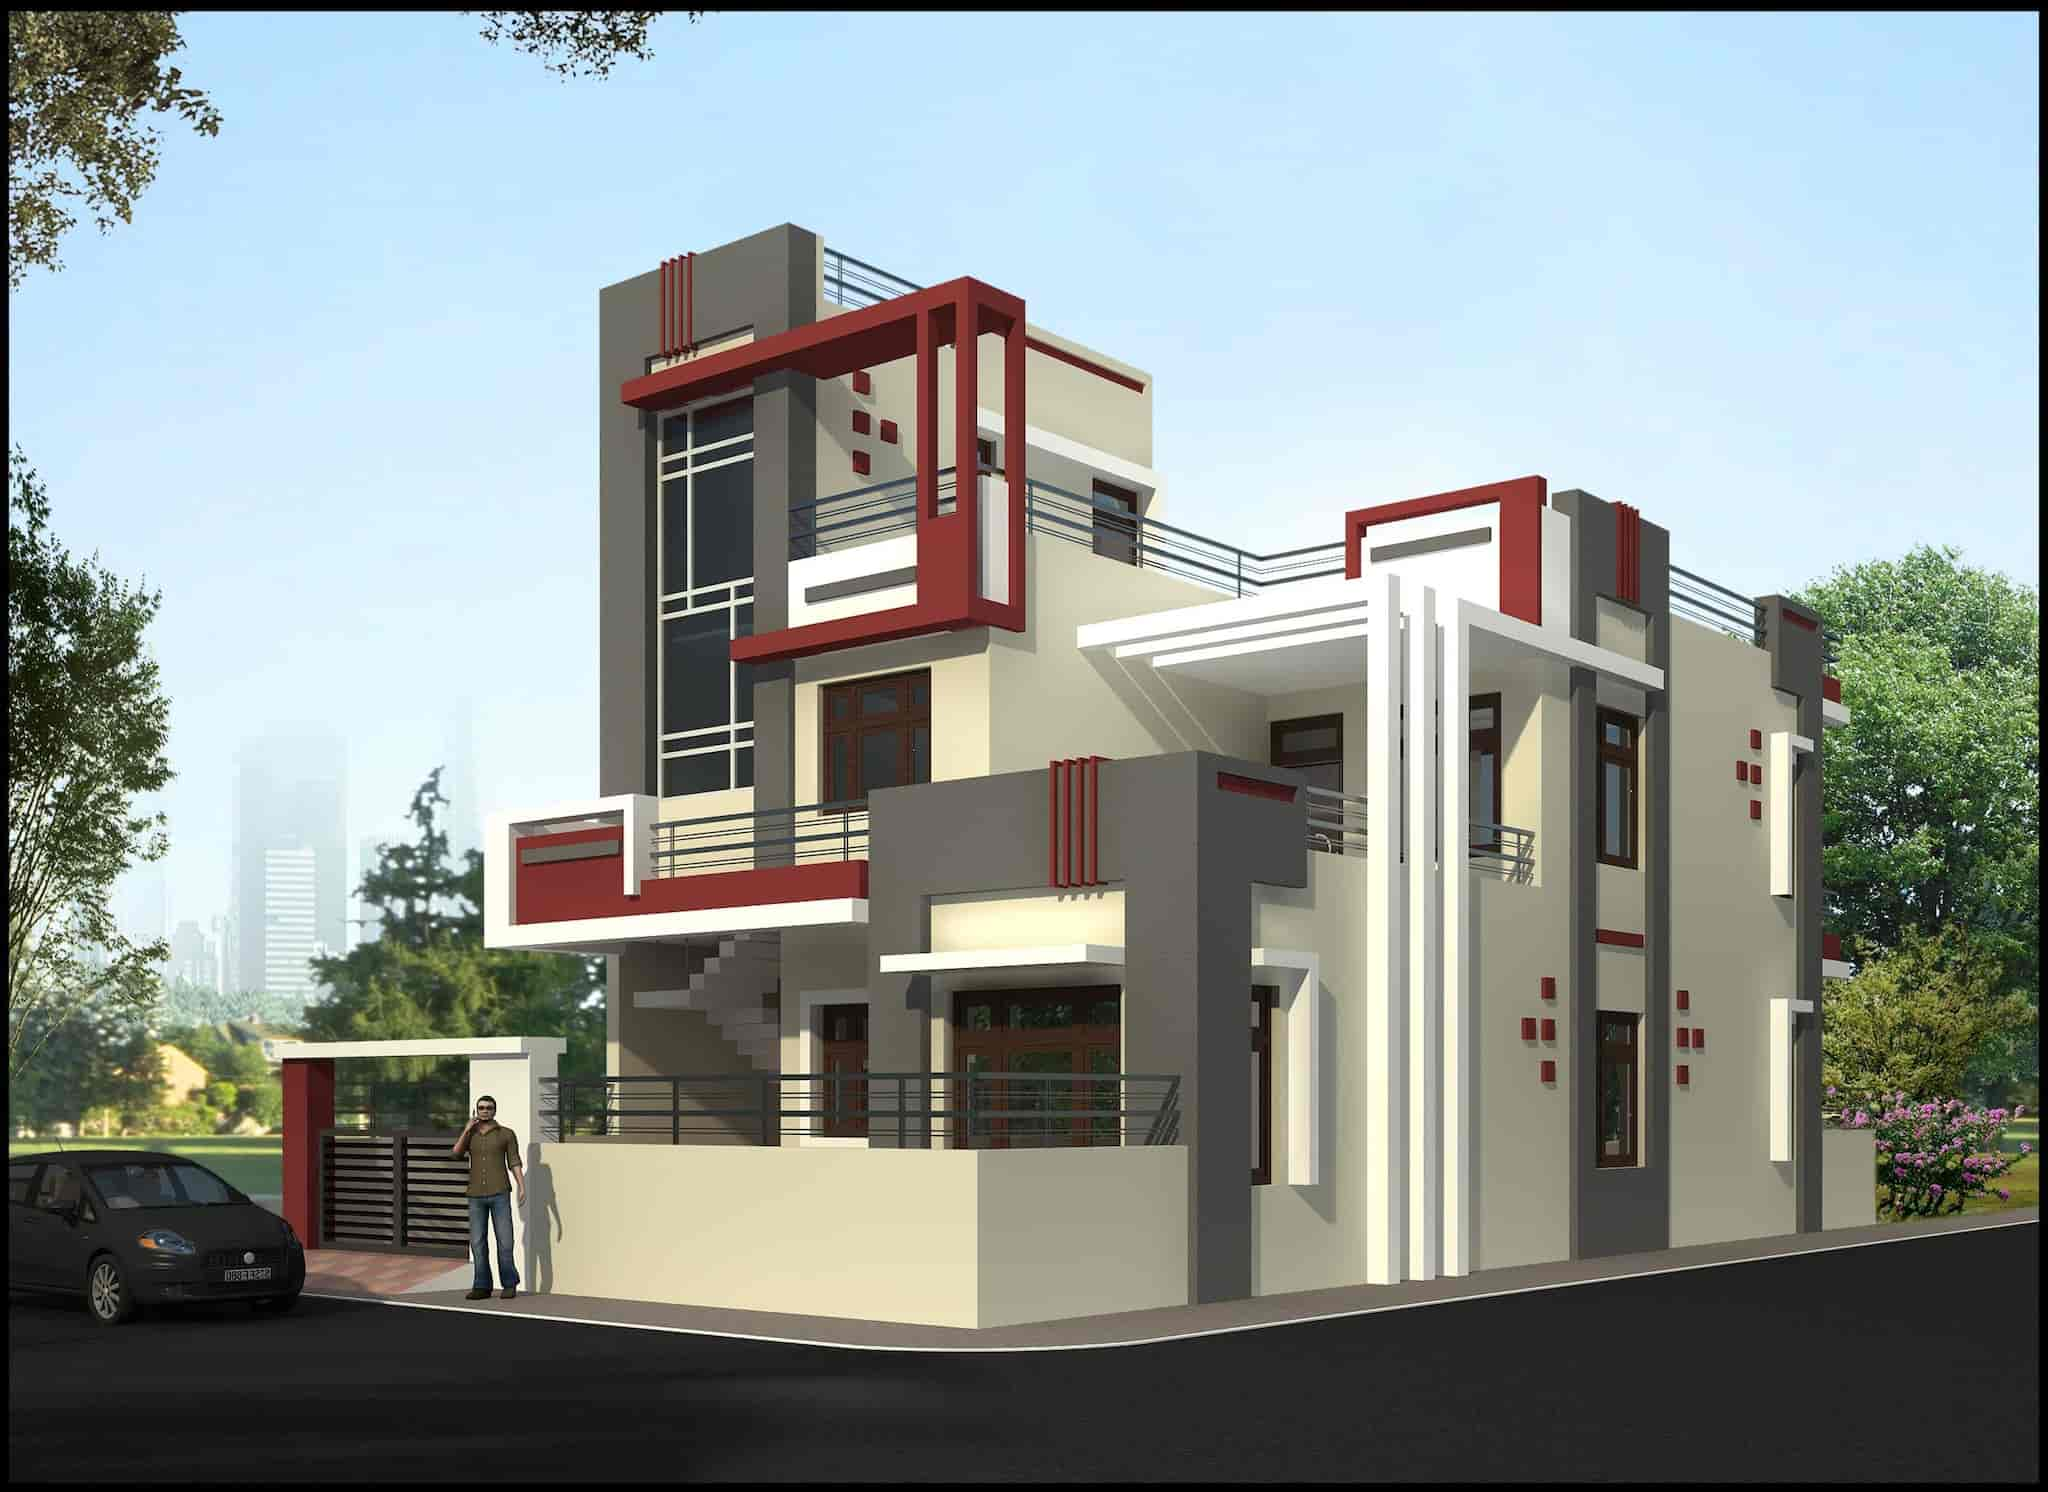 Groovy Modern House Designer Kurukshetra H O Architects In Download Free Architecture Designs Intelgarnamadebymaigaardcom